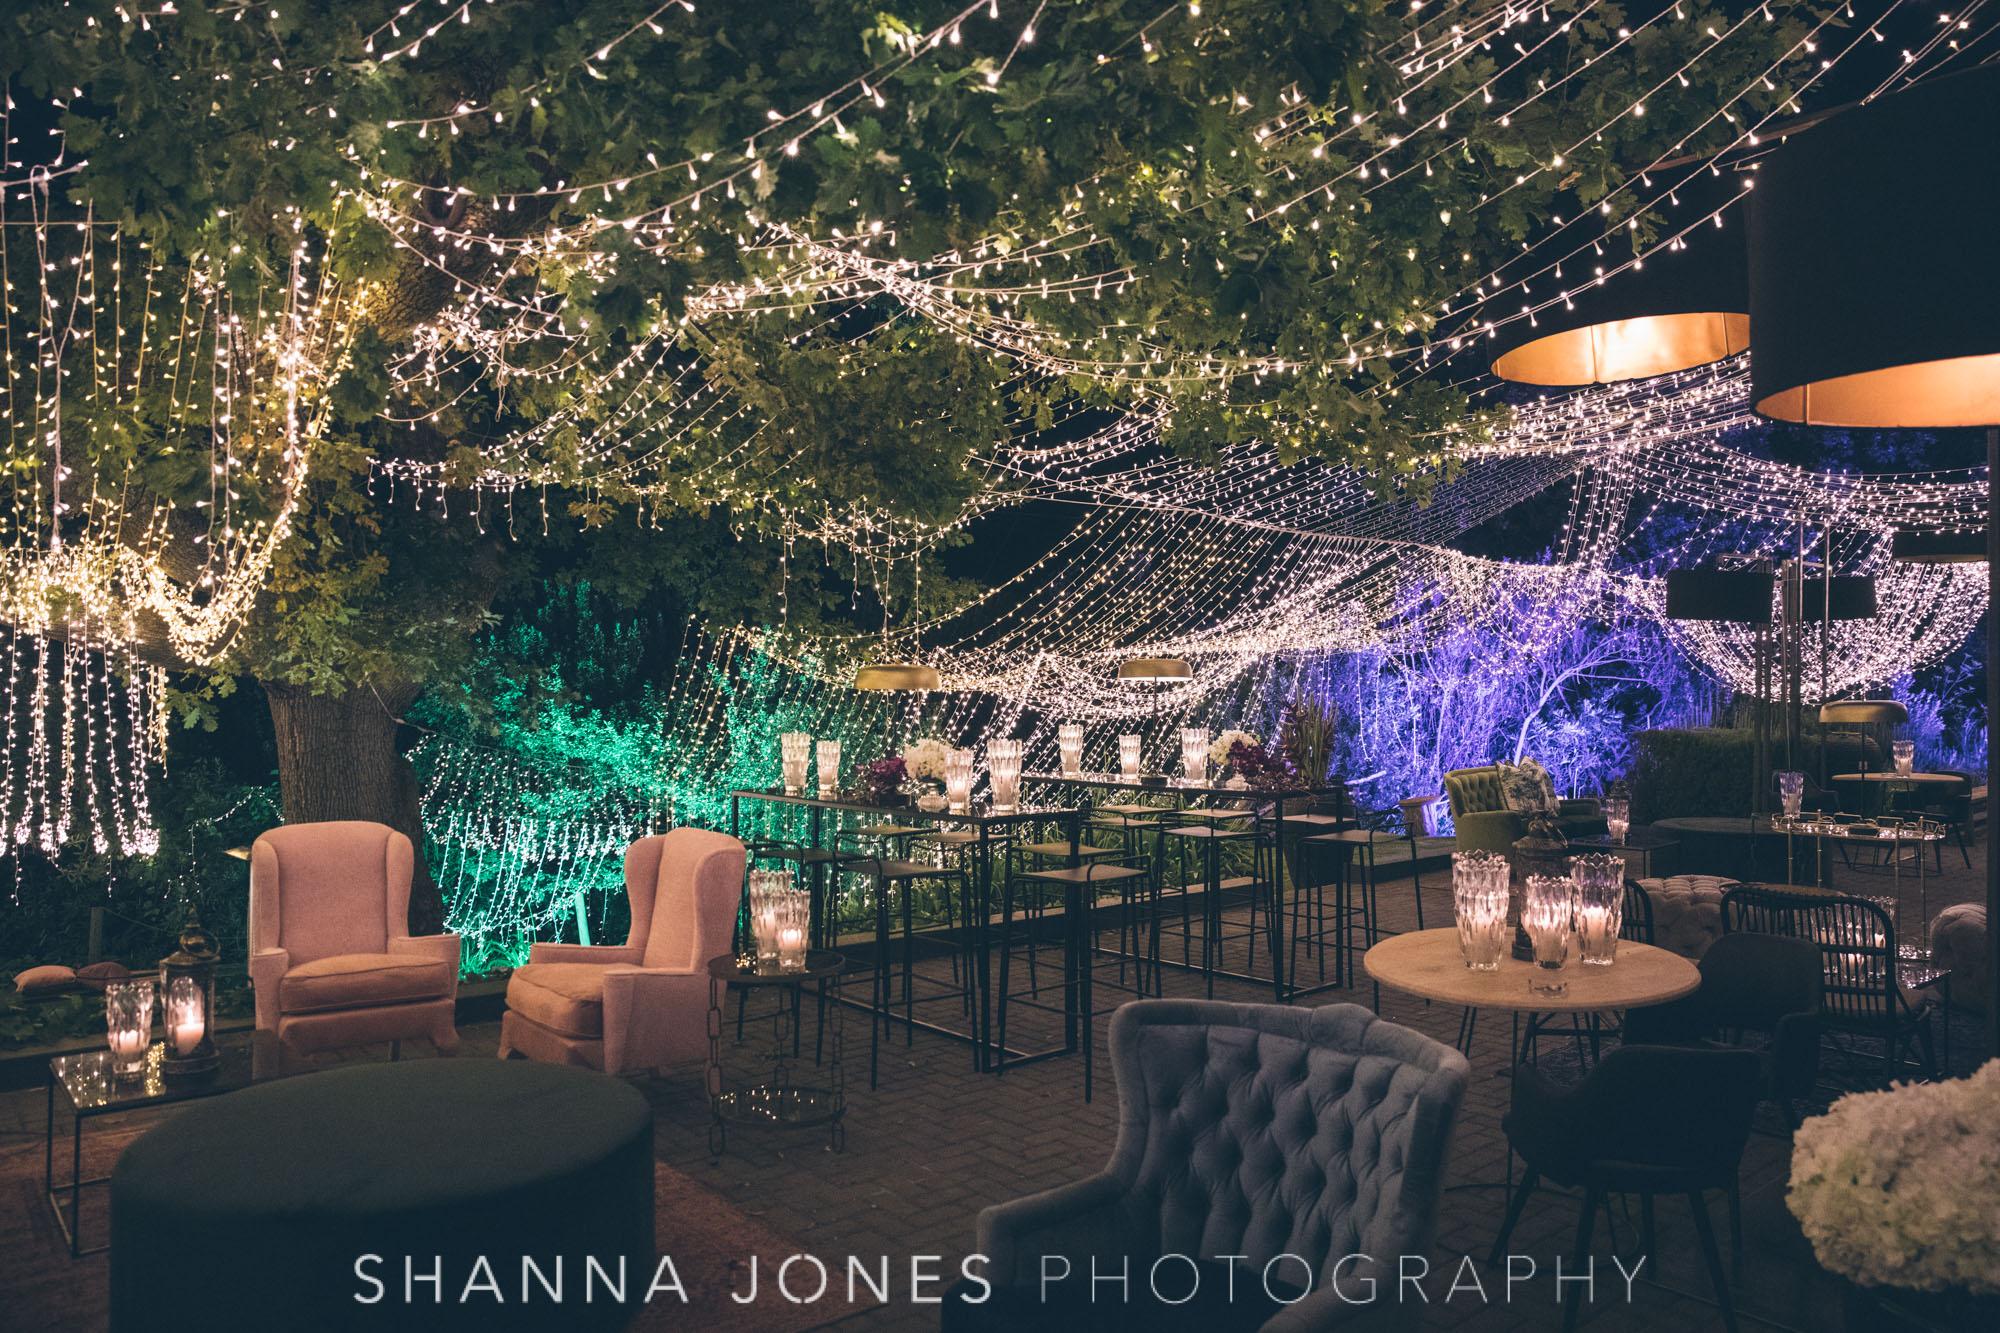 the-conservatory-cape-town-wedding-shanna-jones-photography-nicola-alex-79.jpg